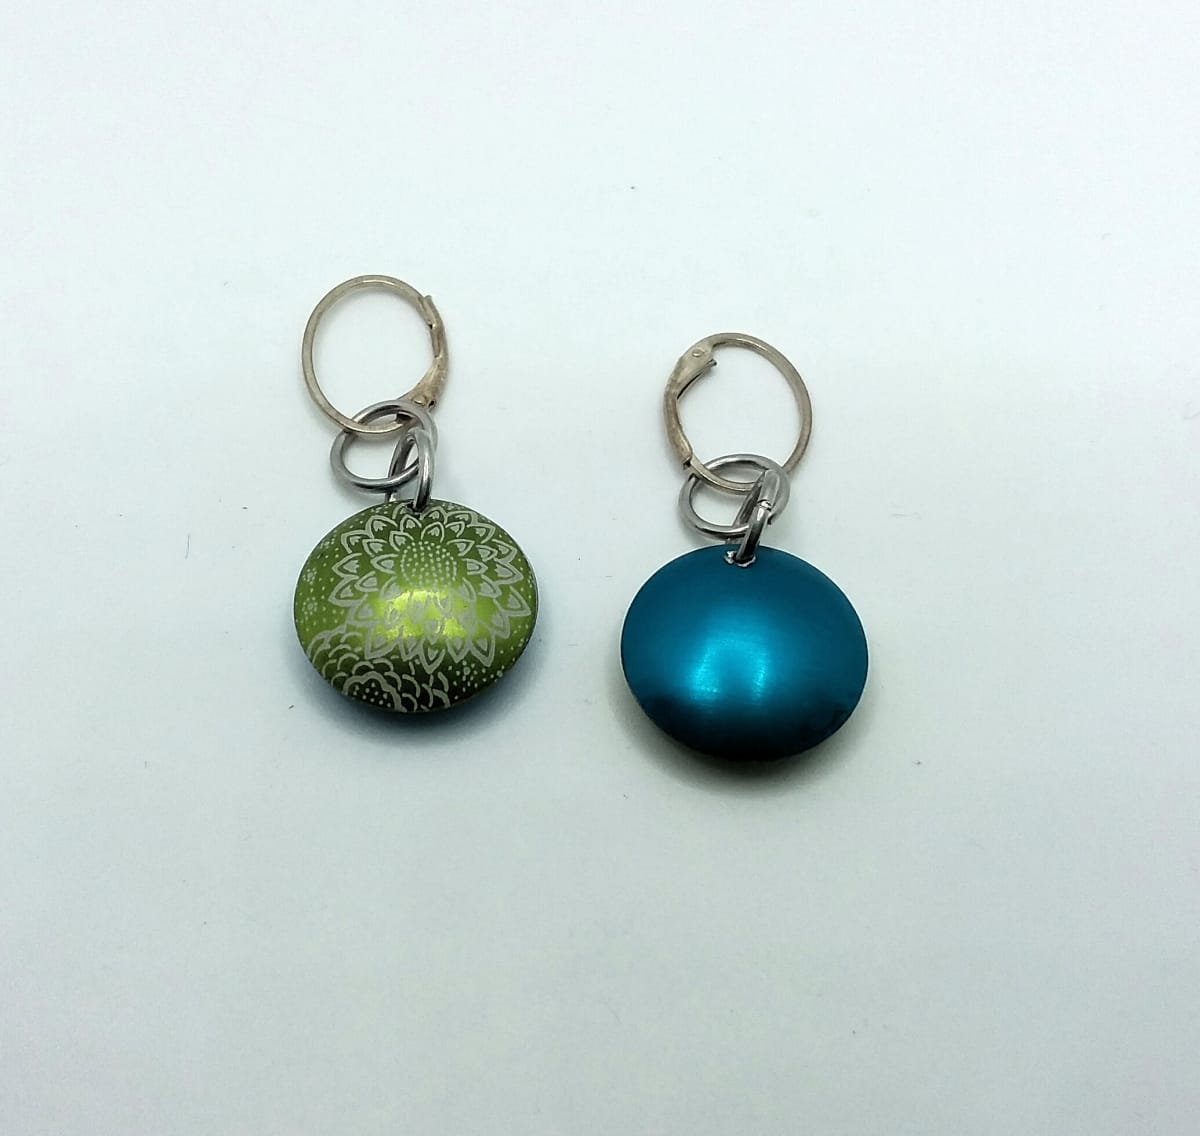 Blue/Green Aluminum Earrings by Judi Werner